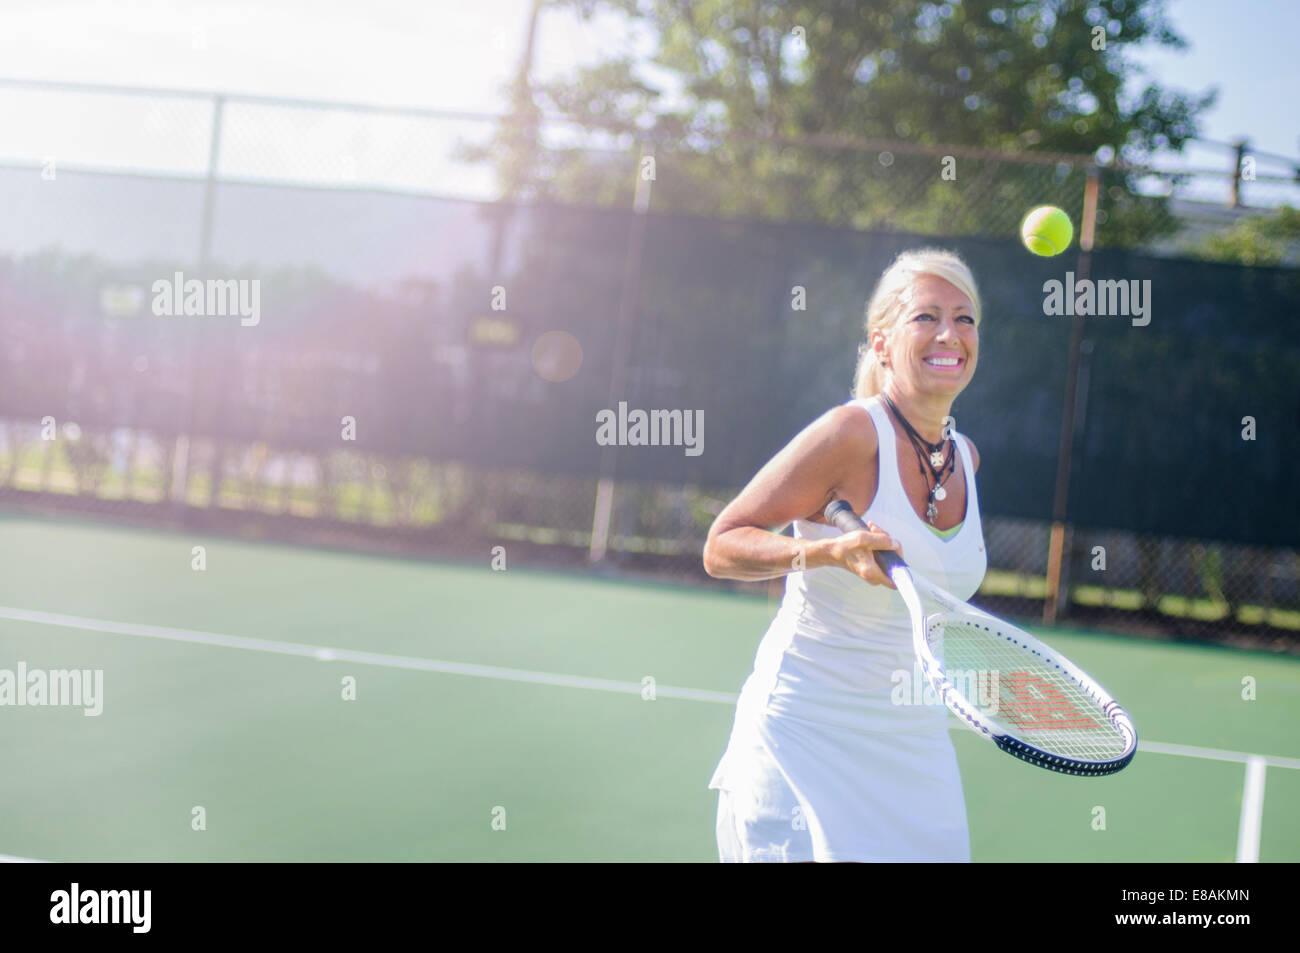 Reife Frau mit dem Tennisspielen lächelnd Stockbild